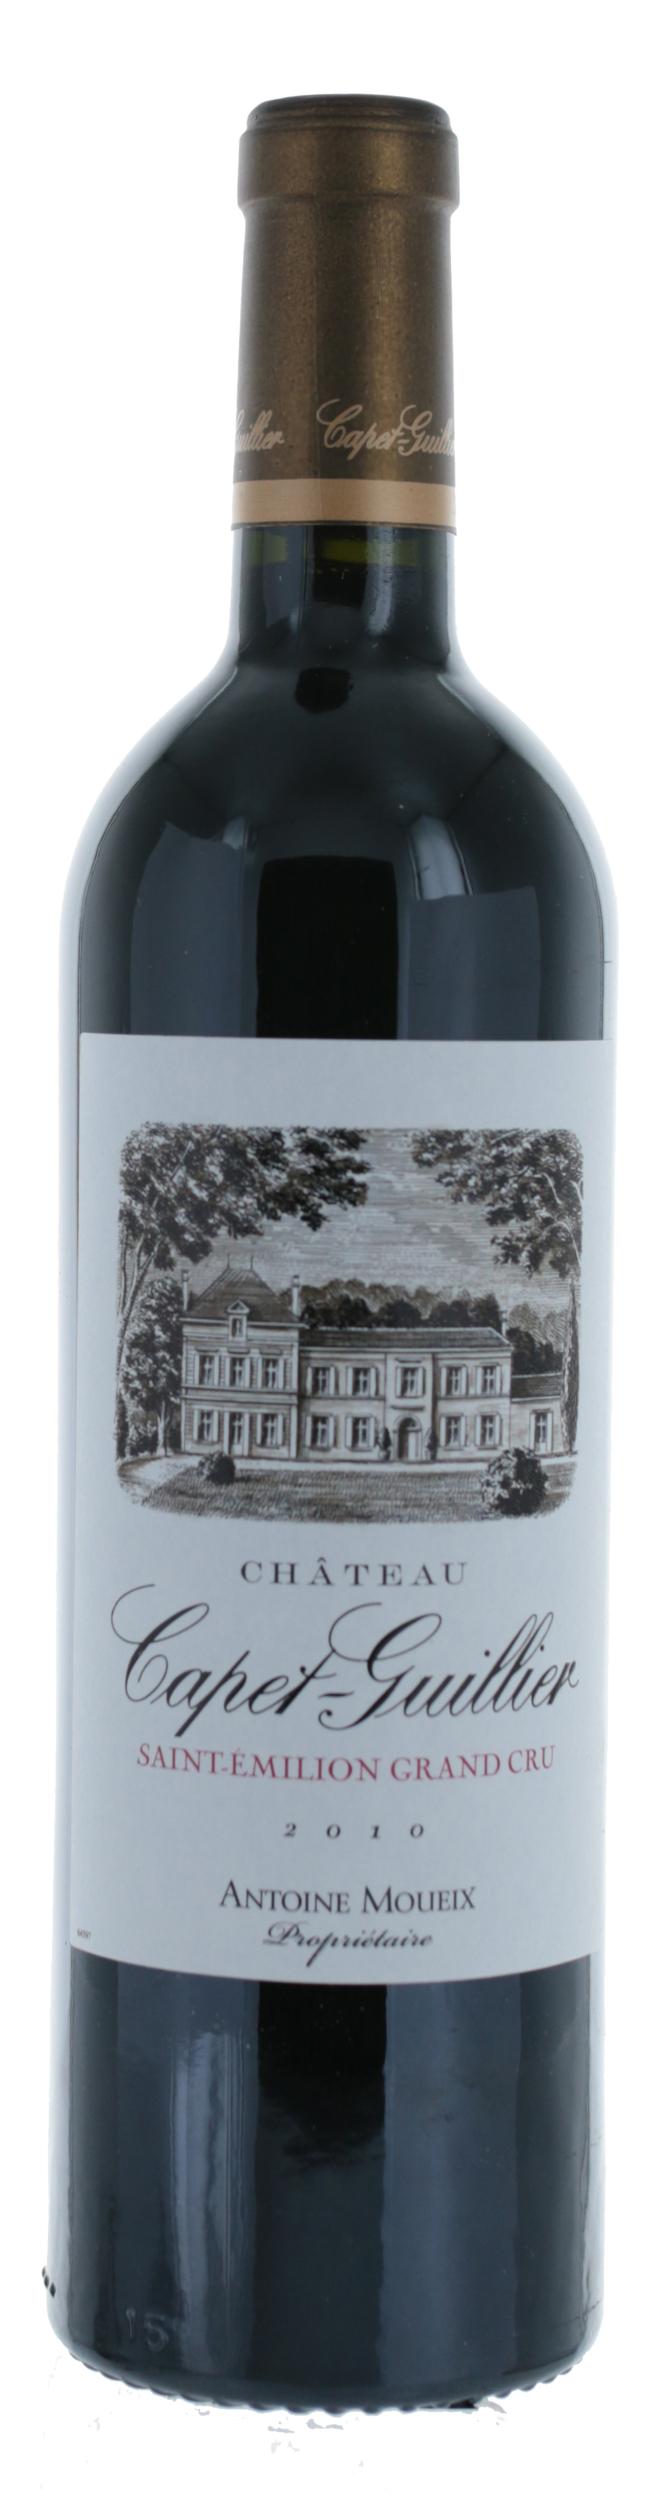 Saint Emilion Grand Cru - Château Capet Guillier - 2014